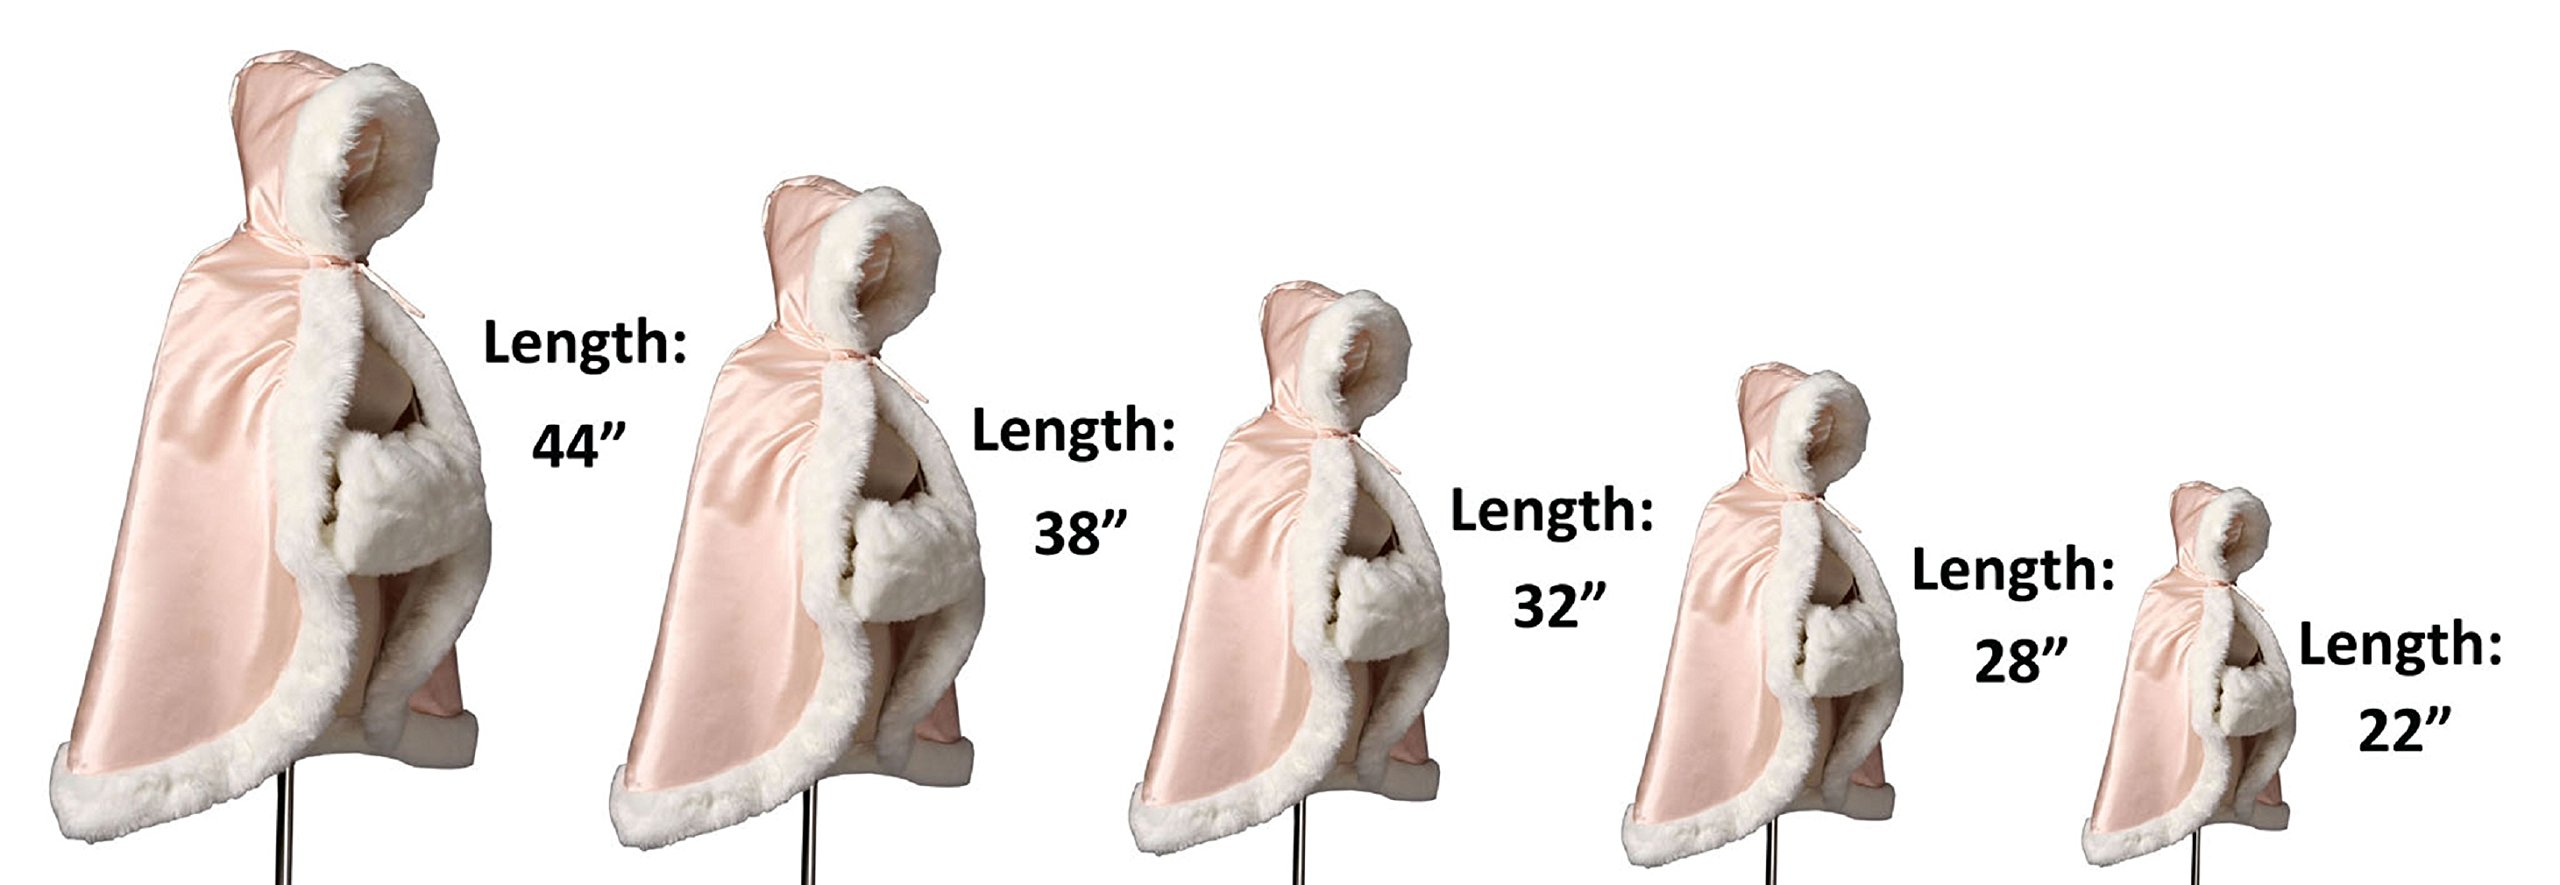 BEAUTELICATE Flower Girl Cape Winter Wedding Cloak for Infant Junior Bridesmaid Hooded Reversible Ivory 44 by BEAUTELICATE (Image #2)